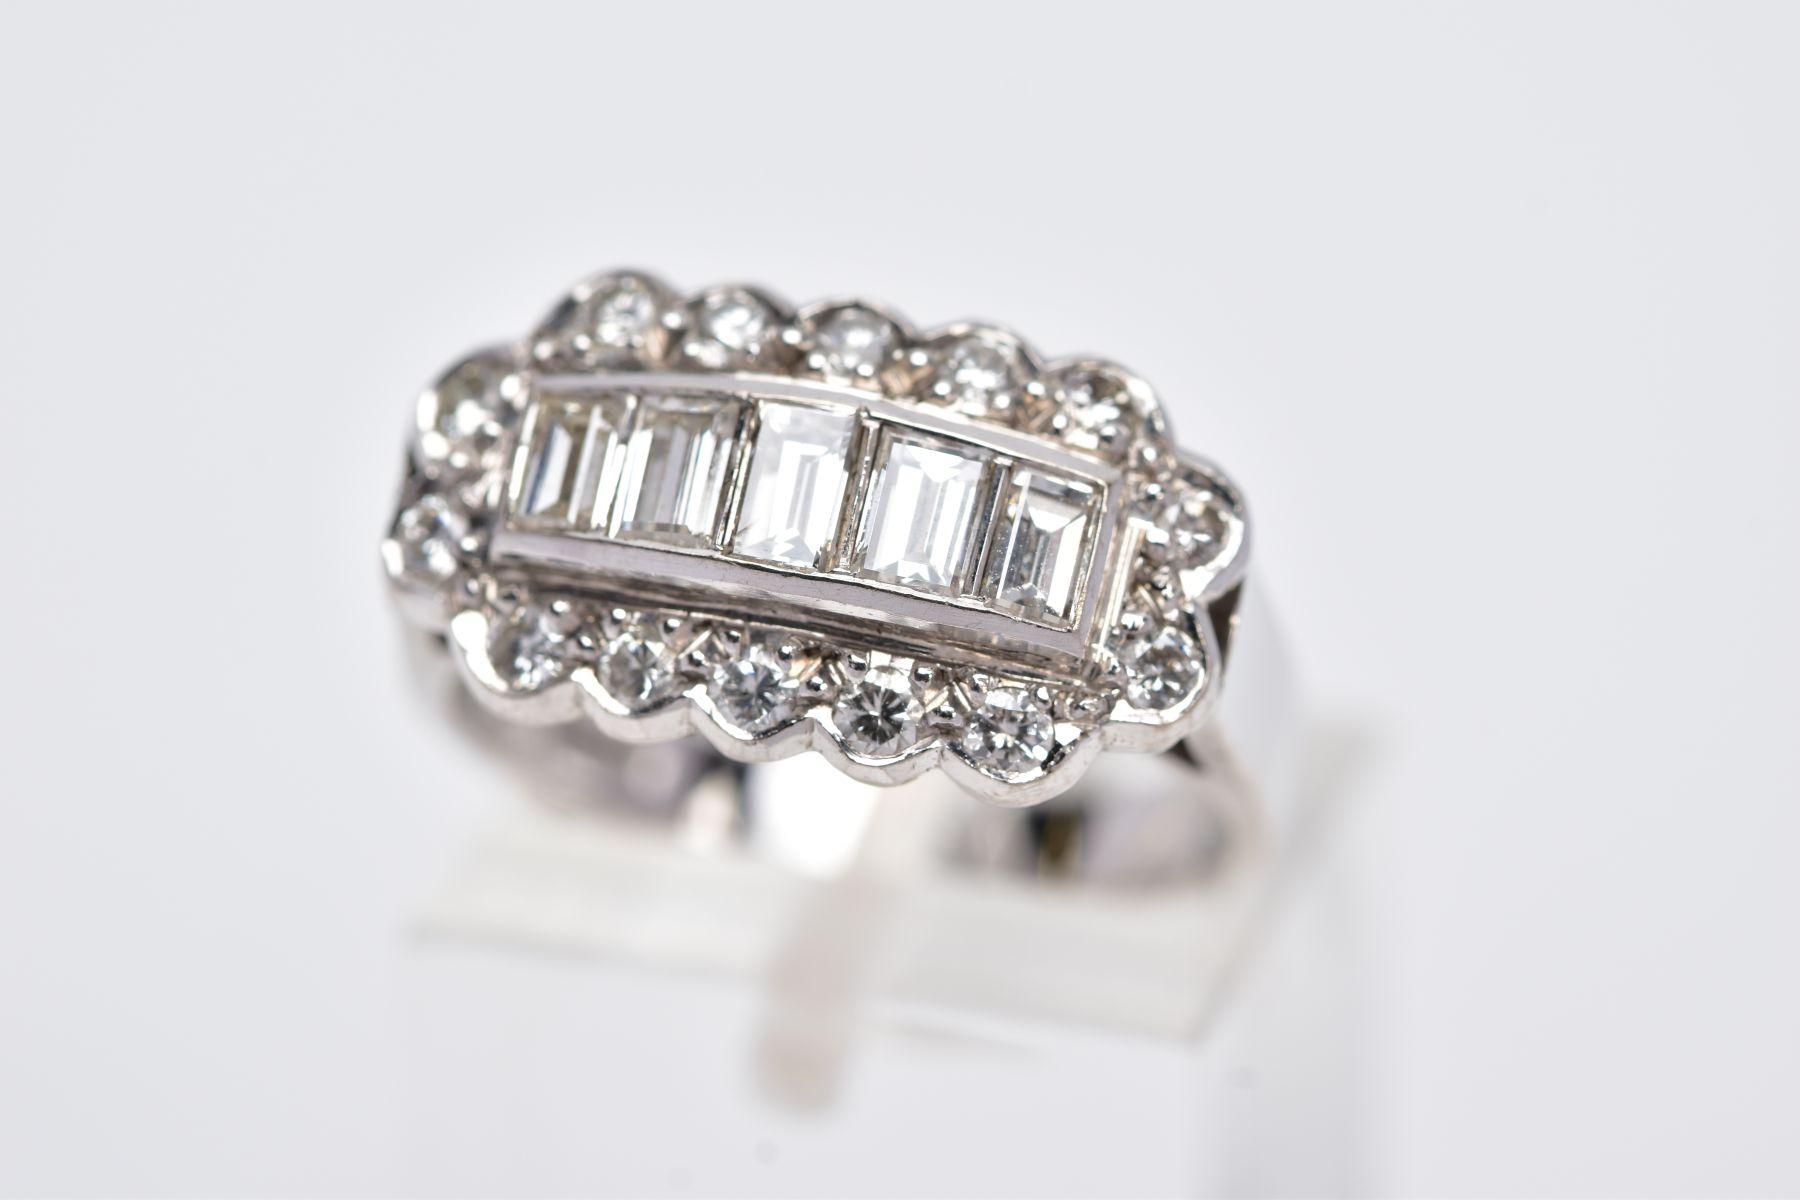 A LATE 20TH CENTURY 18CT WHITE DIAMOND DRESS RING, comprising five trap cut diamonds each